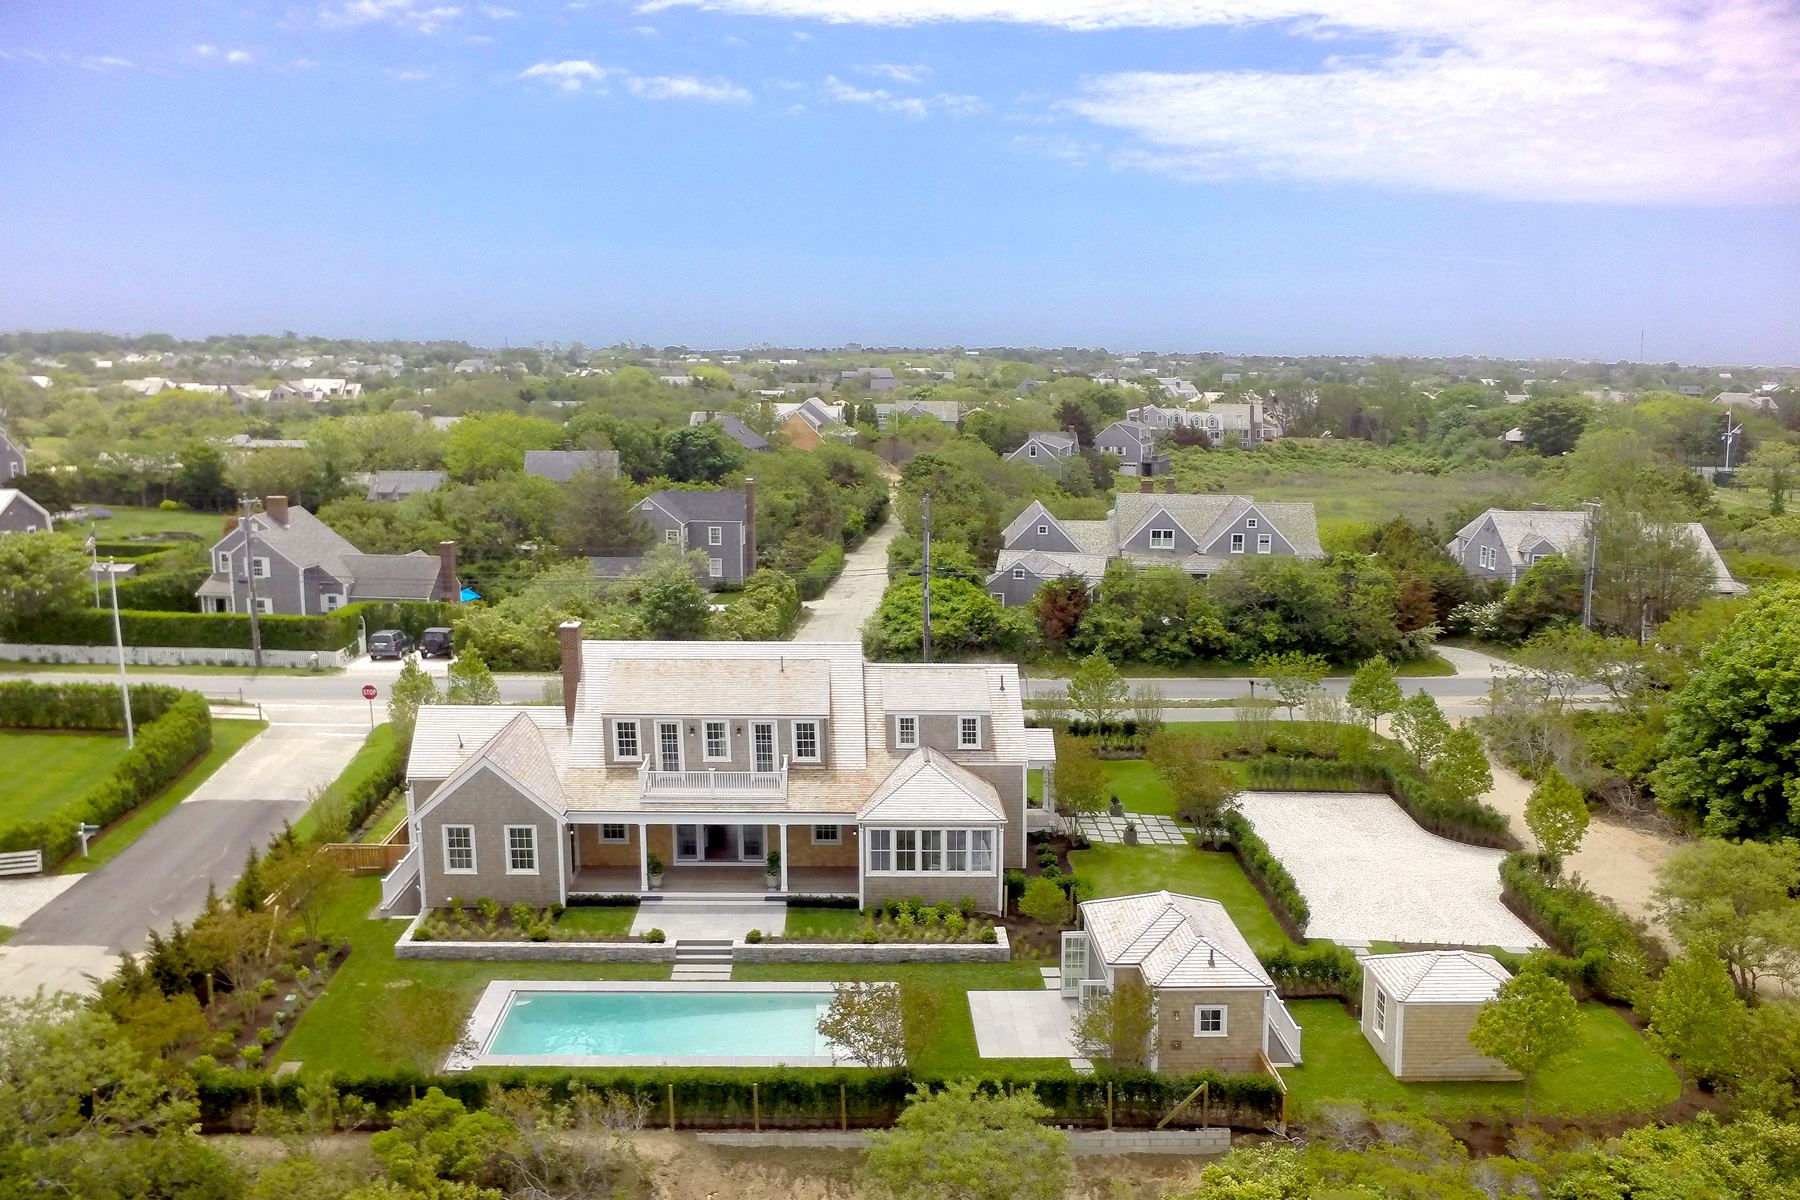 Villa per Vendita alle ore Best in Class 1 Cliff Lane Nantucket, Massachusetts 02554 Stati Uniti